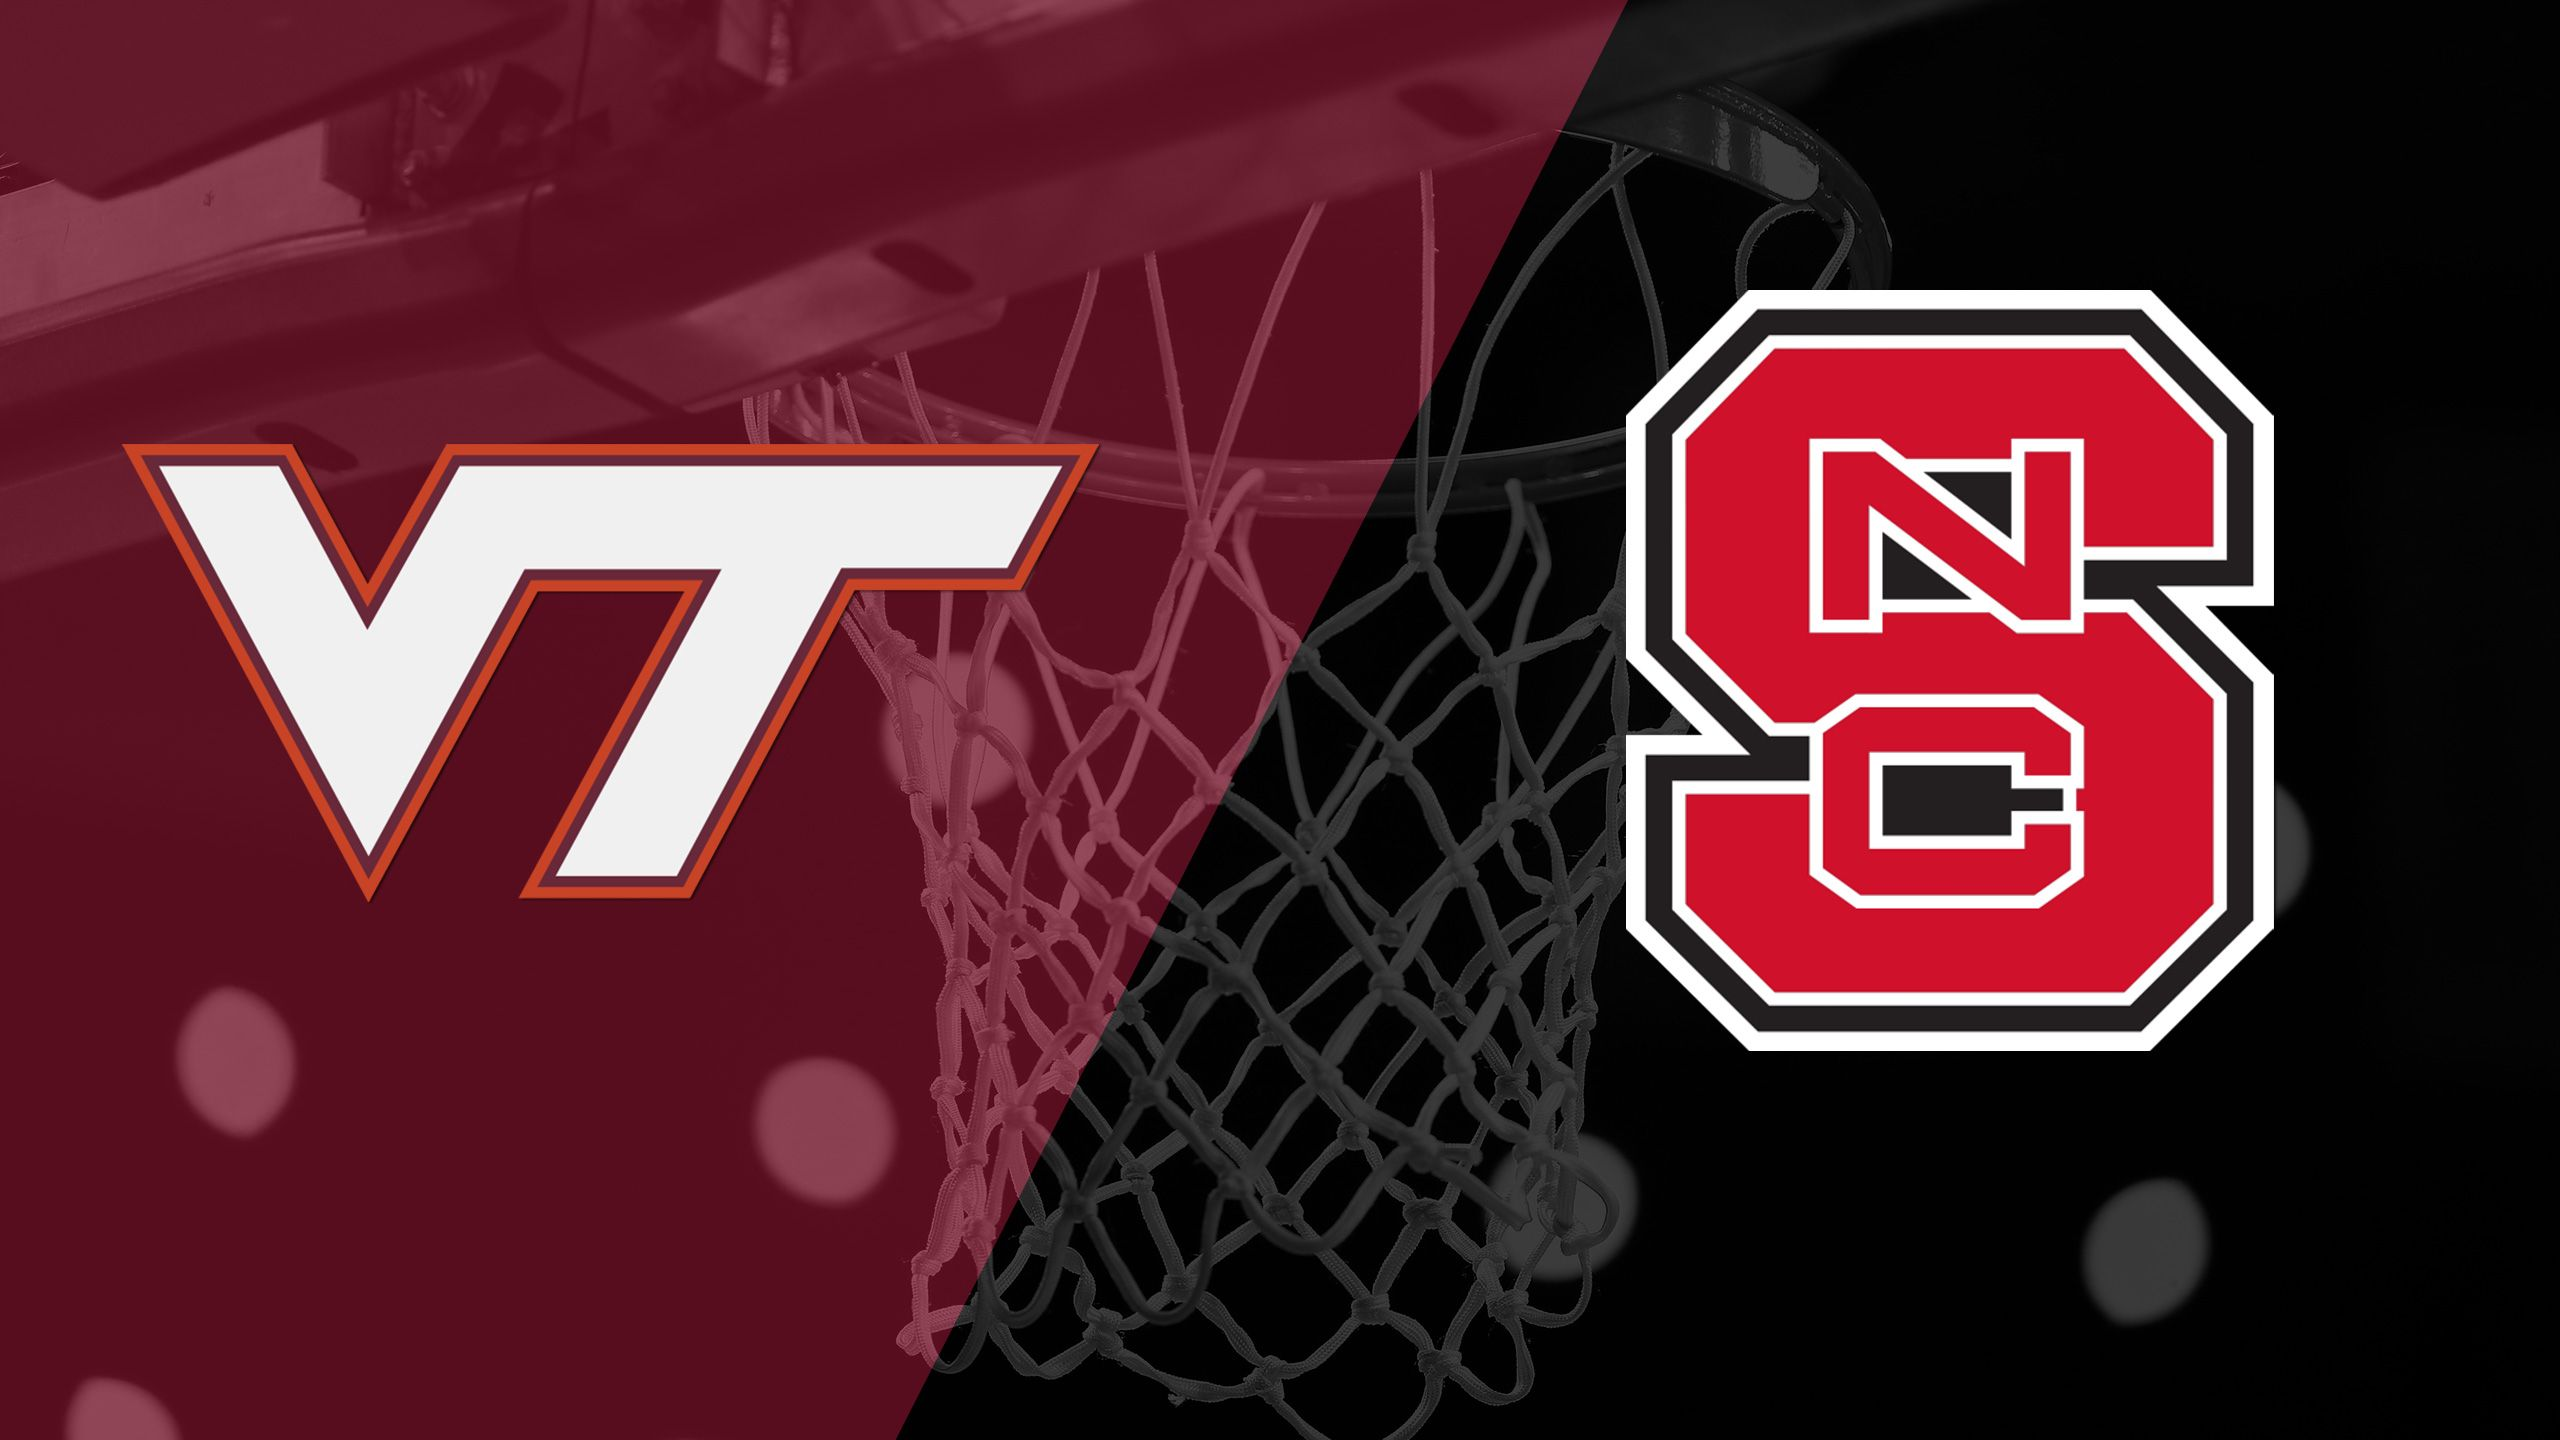 #21 Virginia Tech vs. NC State (M Basketball)